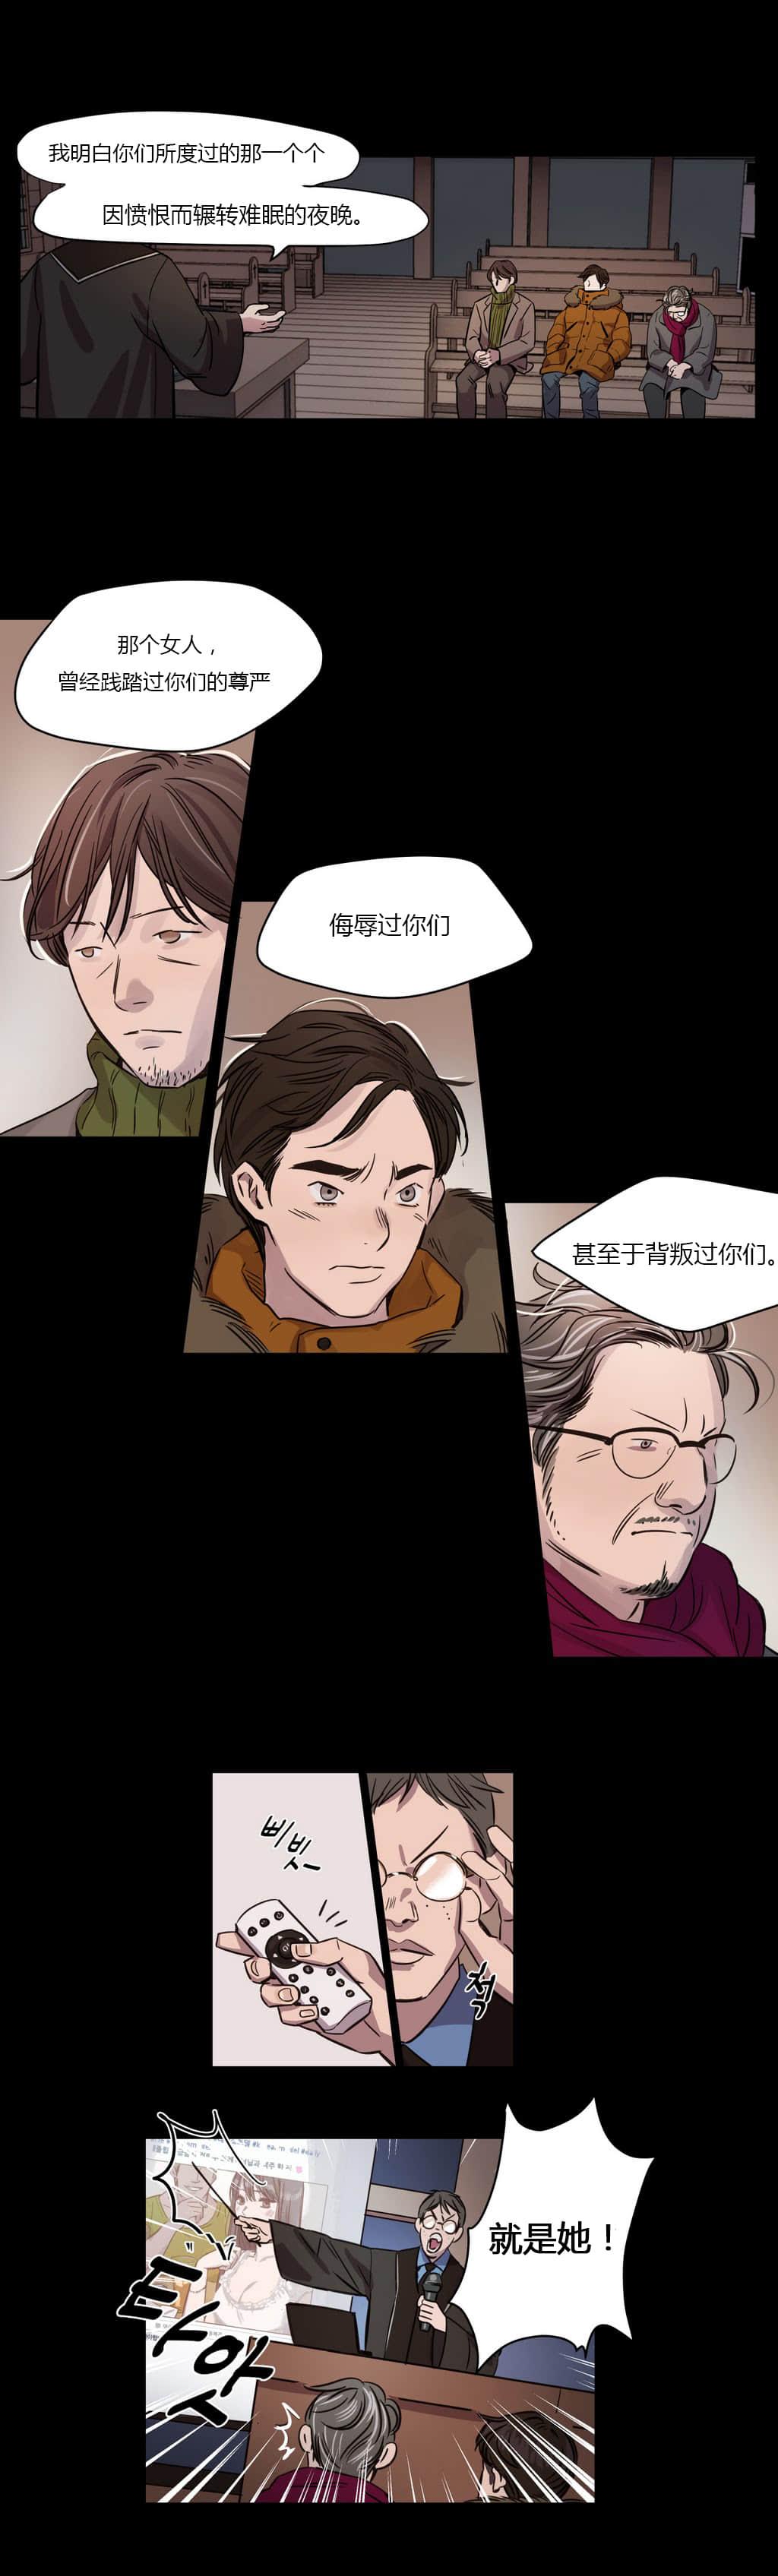 highschoolsimulator2021日本漫画